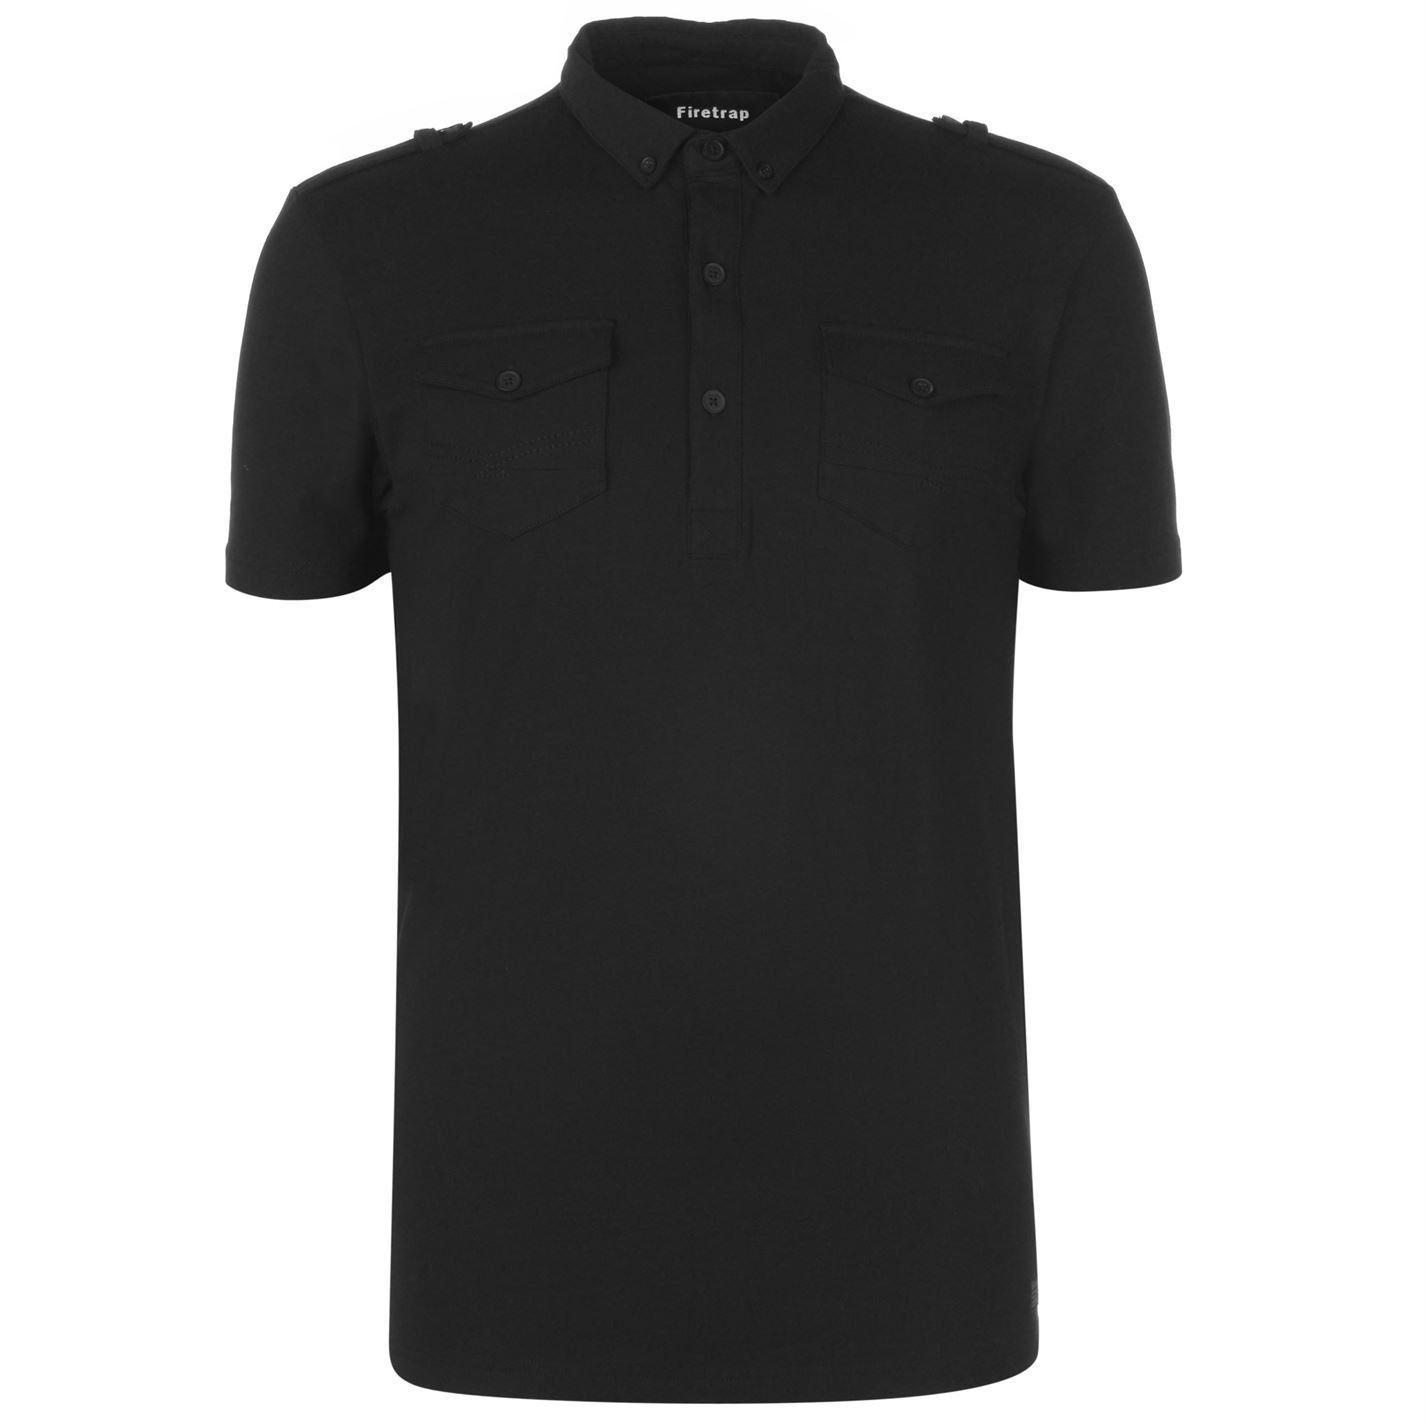 thumbnail 4 - Firetrap-Double-Pocket-Polo-Shirt-Mens-Collar-Top-Tee-Black-Medium